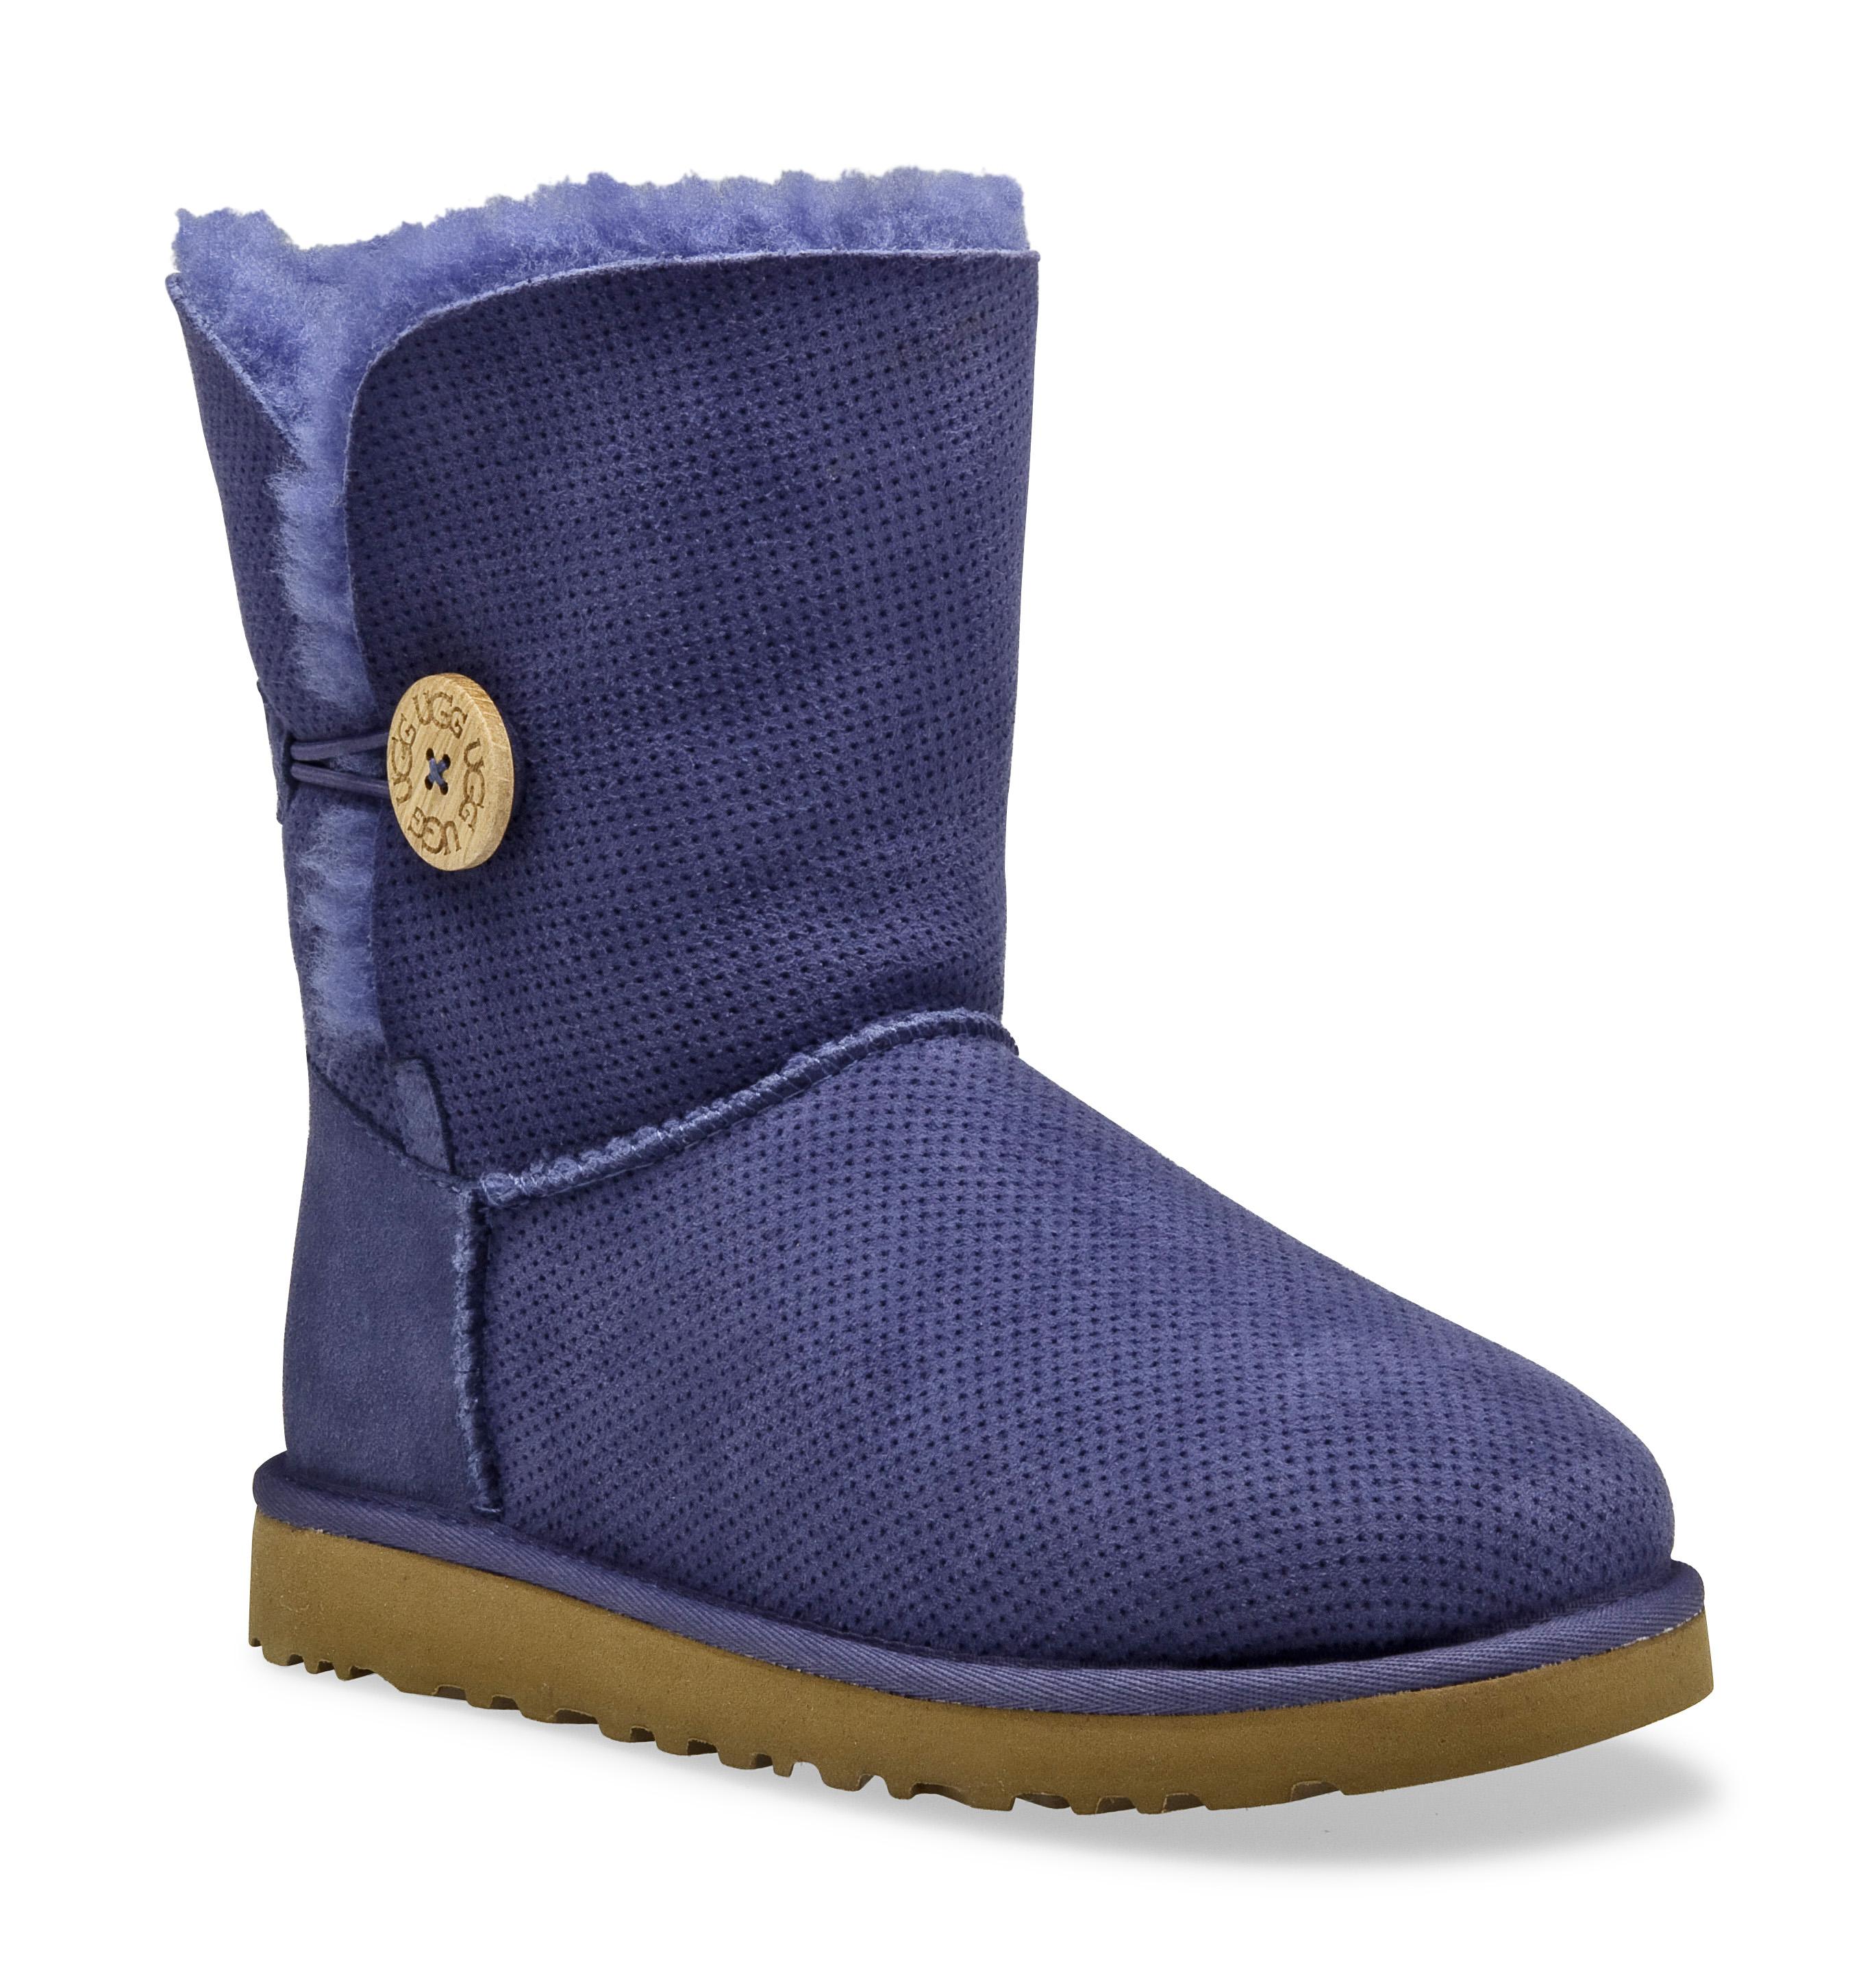 http://www.danielfootwear.com/blog/wp-content/uploads/2011/03/3056_baileybutton-perf_mdb.jpg